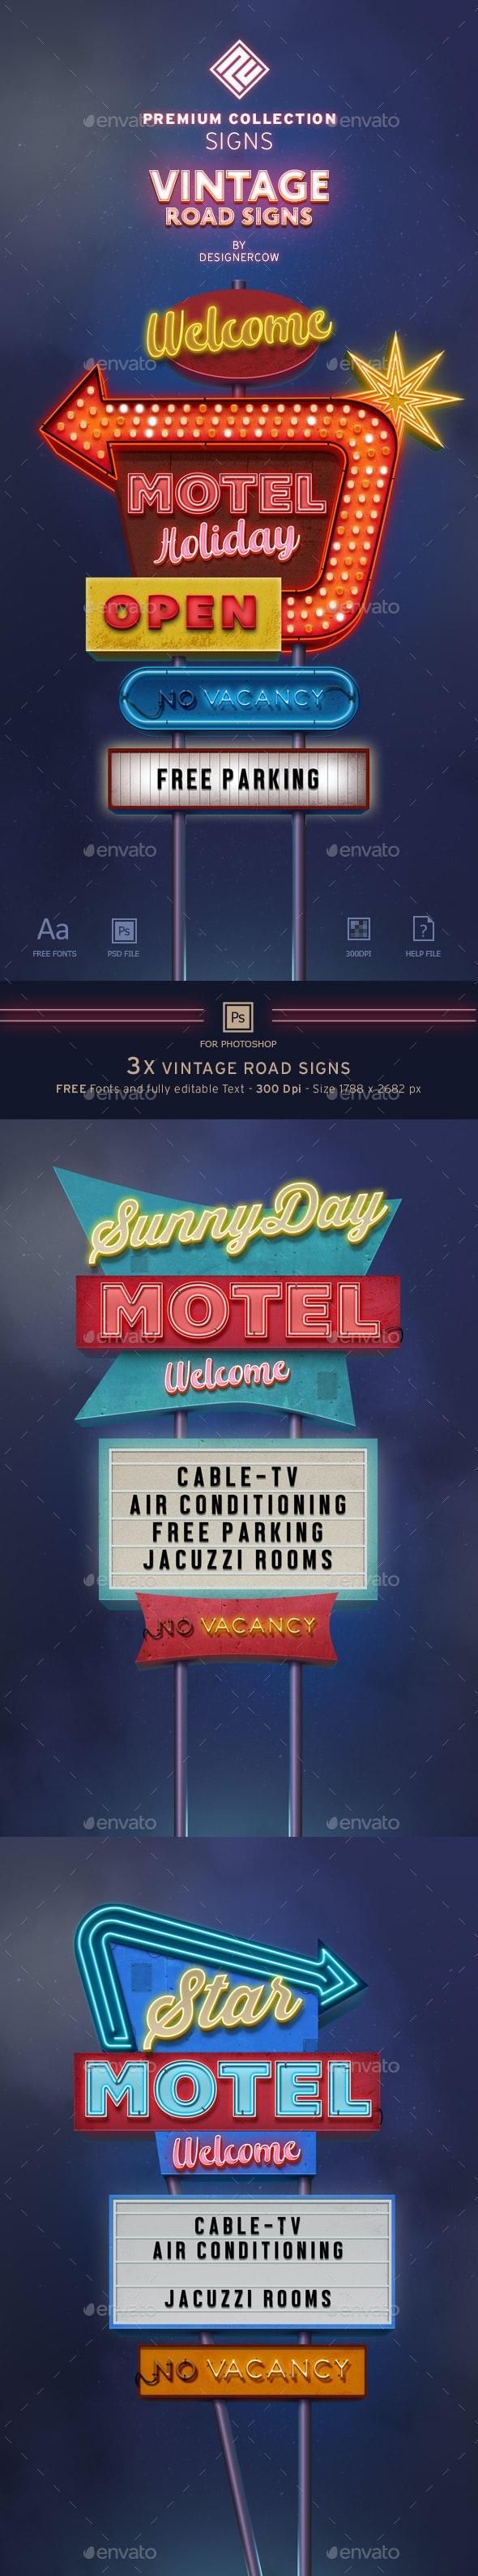 Vintage Neon Road Signs - Premium Collection - Miscellaneous Graphics